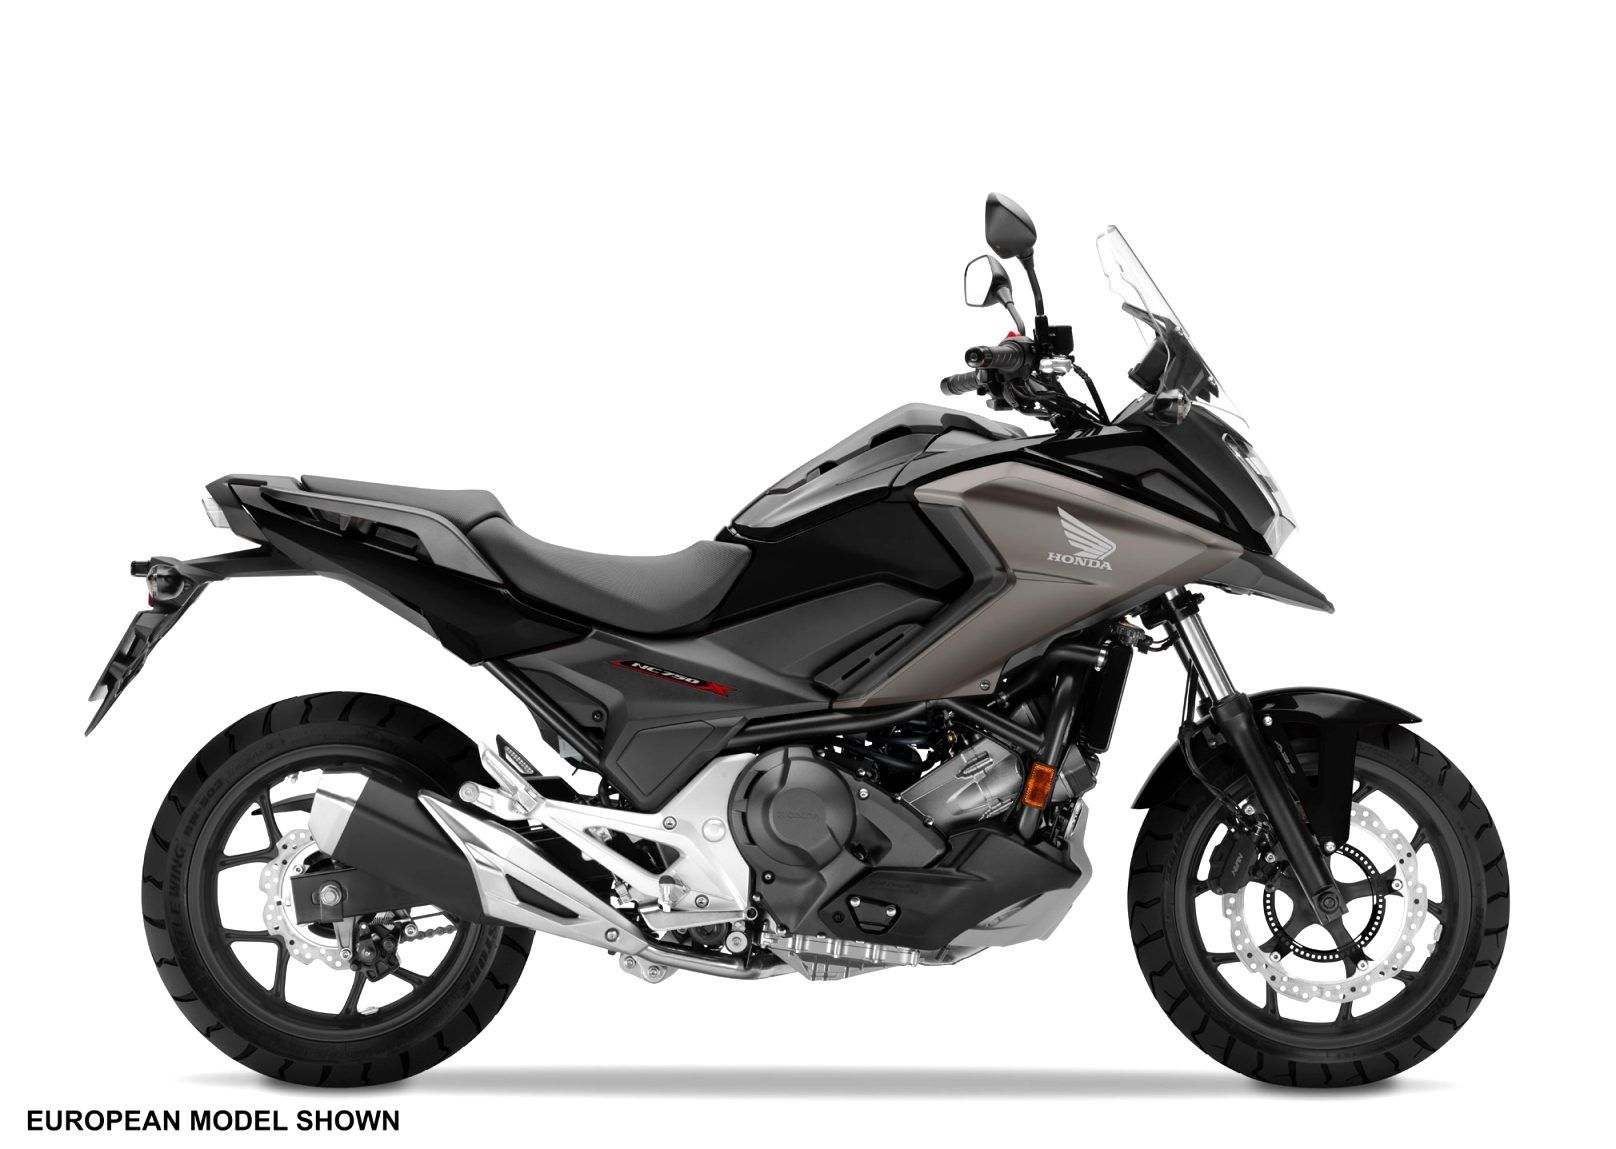 2021 Honda Nc750x Dct Pictures в 2021 г Мотоциклы Honda Мотоцикл Транспорт